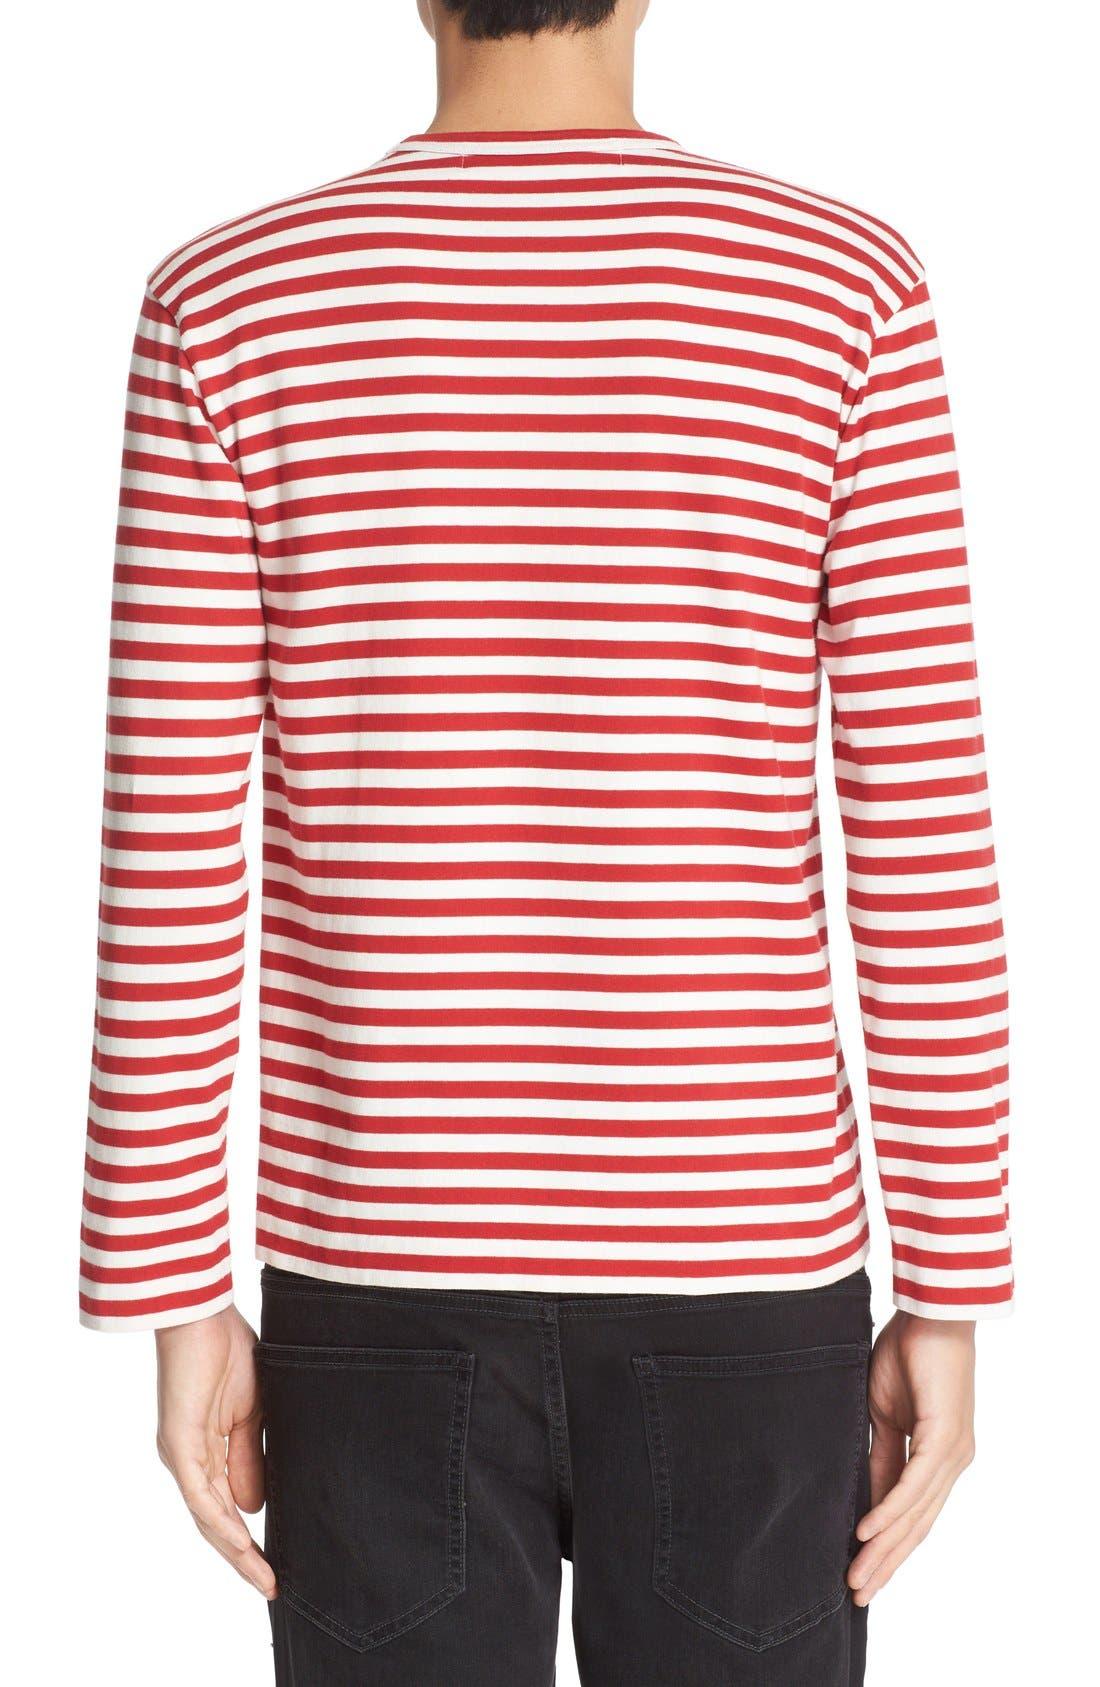 COMME DES GARÇONS PLAY, Stripe Long Sleeve T-Shirt, Alternate thumbnail 2, color, RED/ WHITE